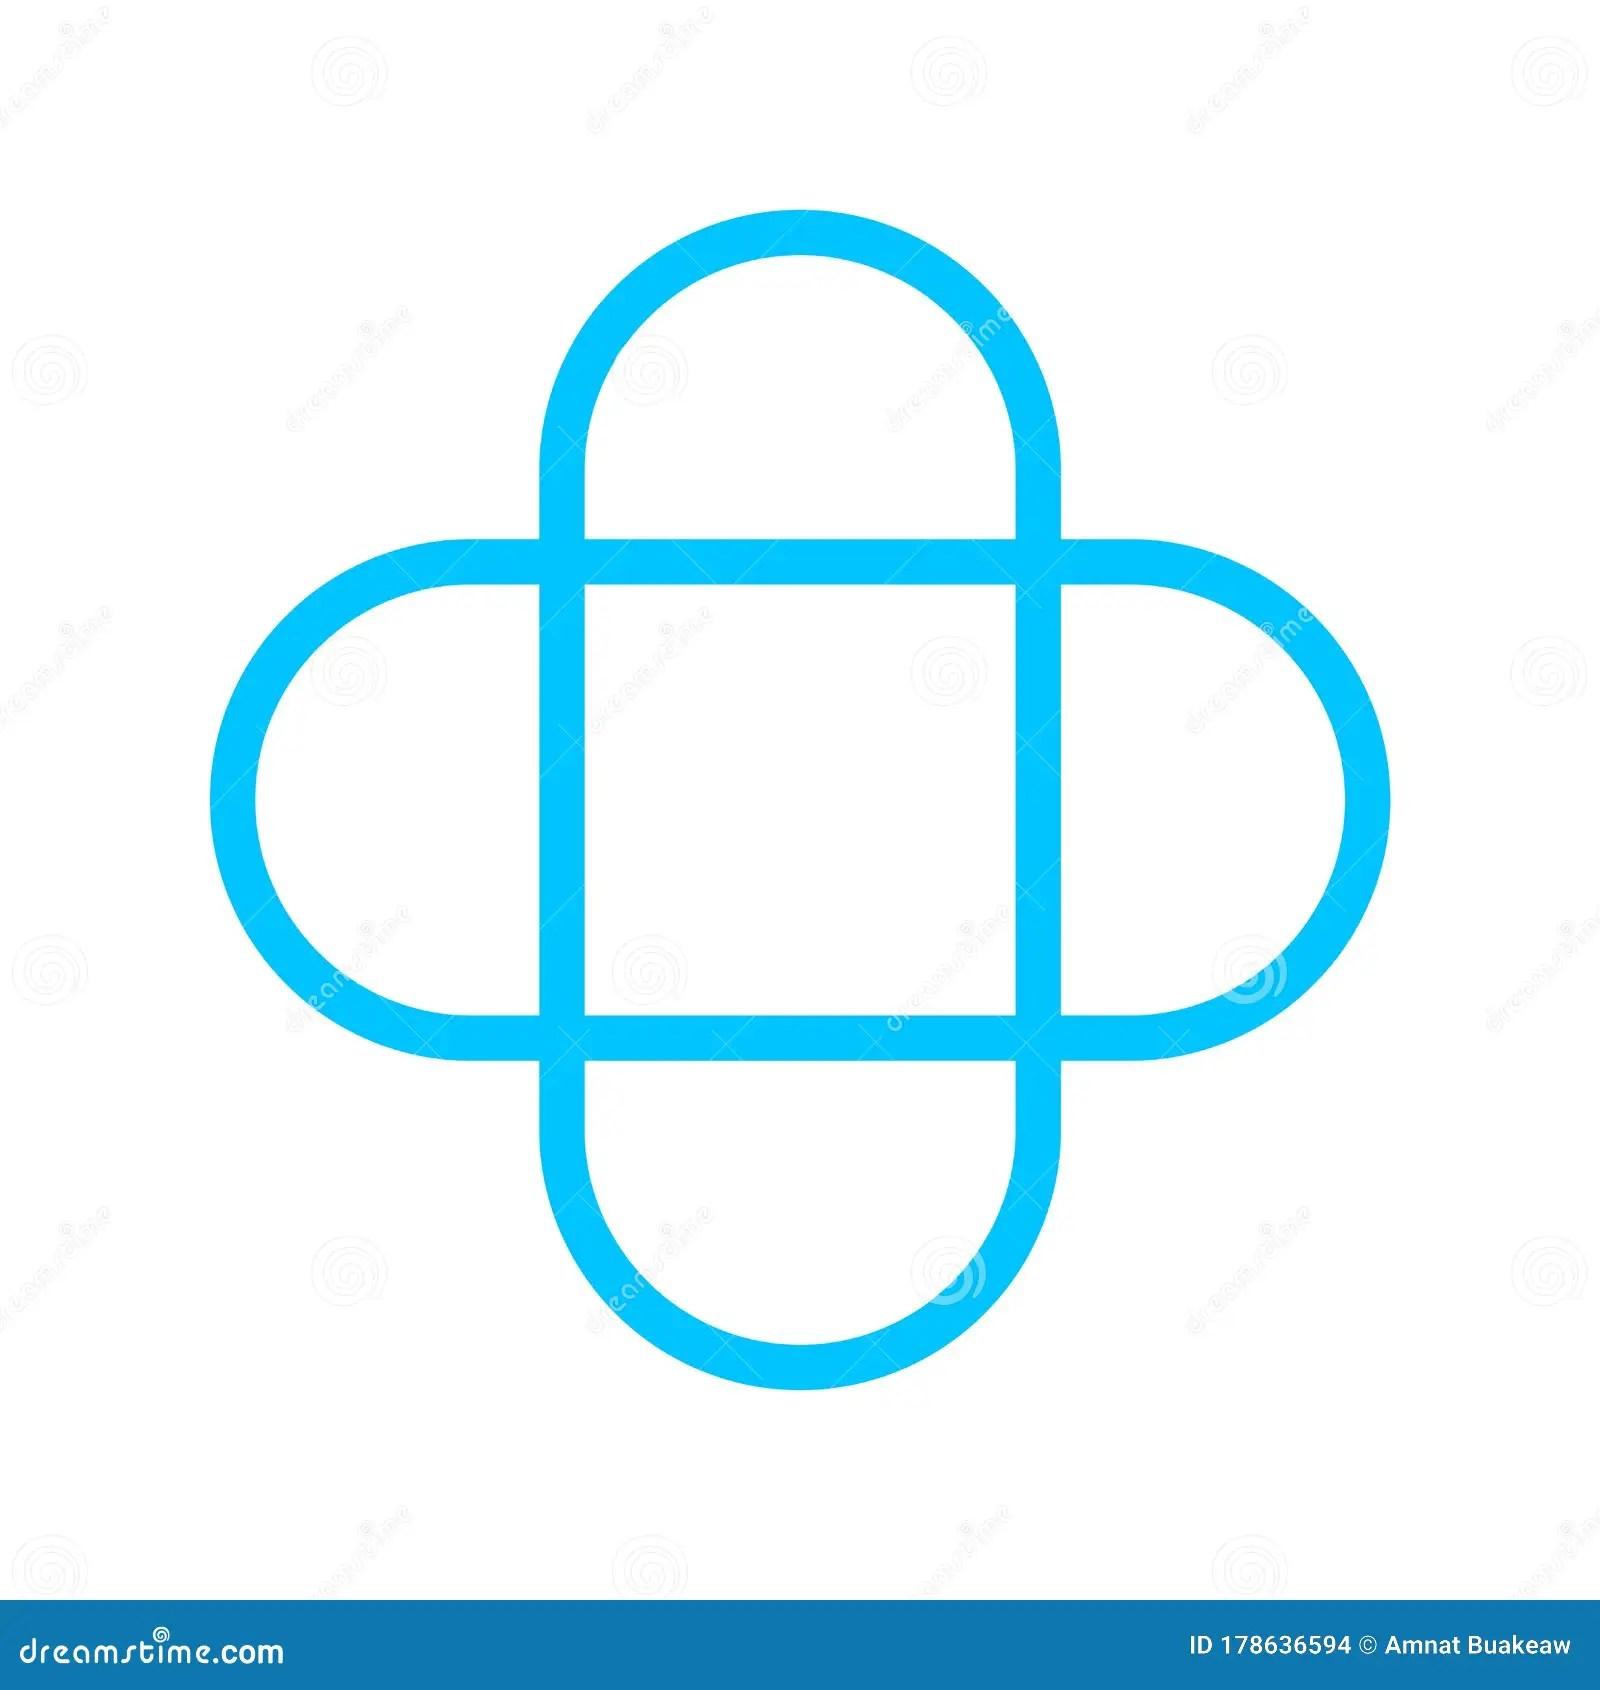 Plus Sign Stroke Line Blue Color For Button Cross Sign